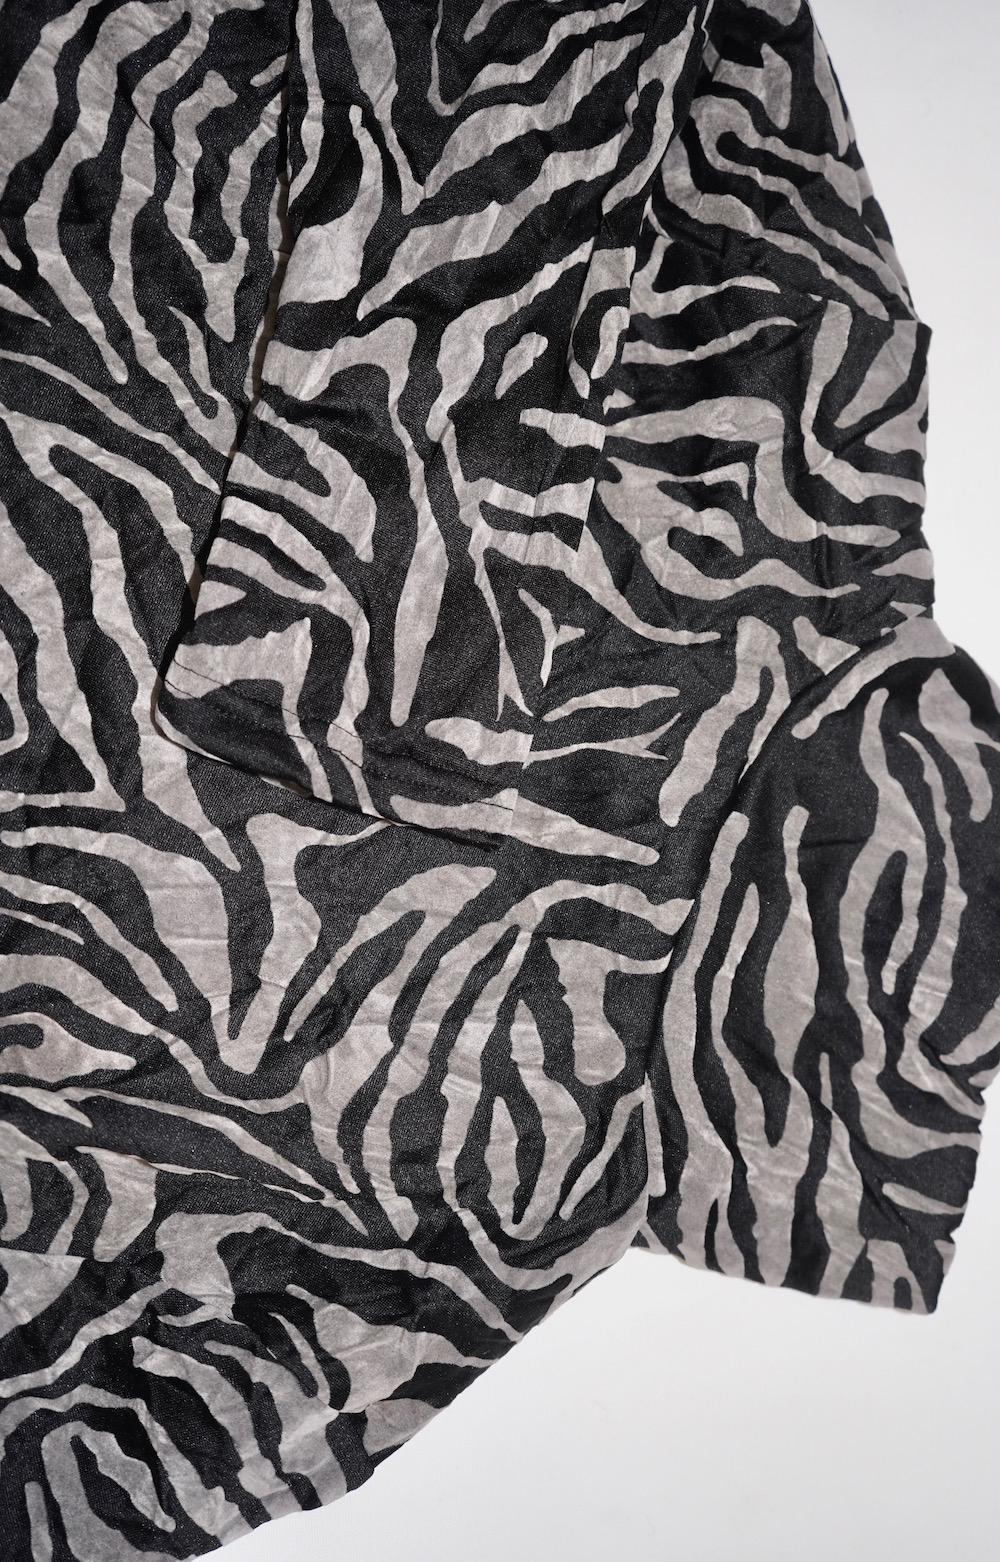 Zebra Pattern High-Neck Tops (grey)